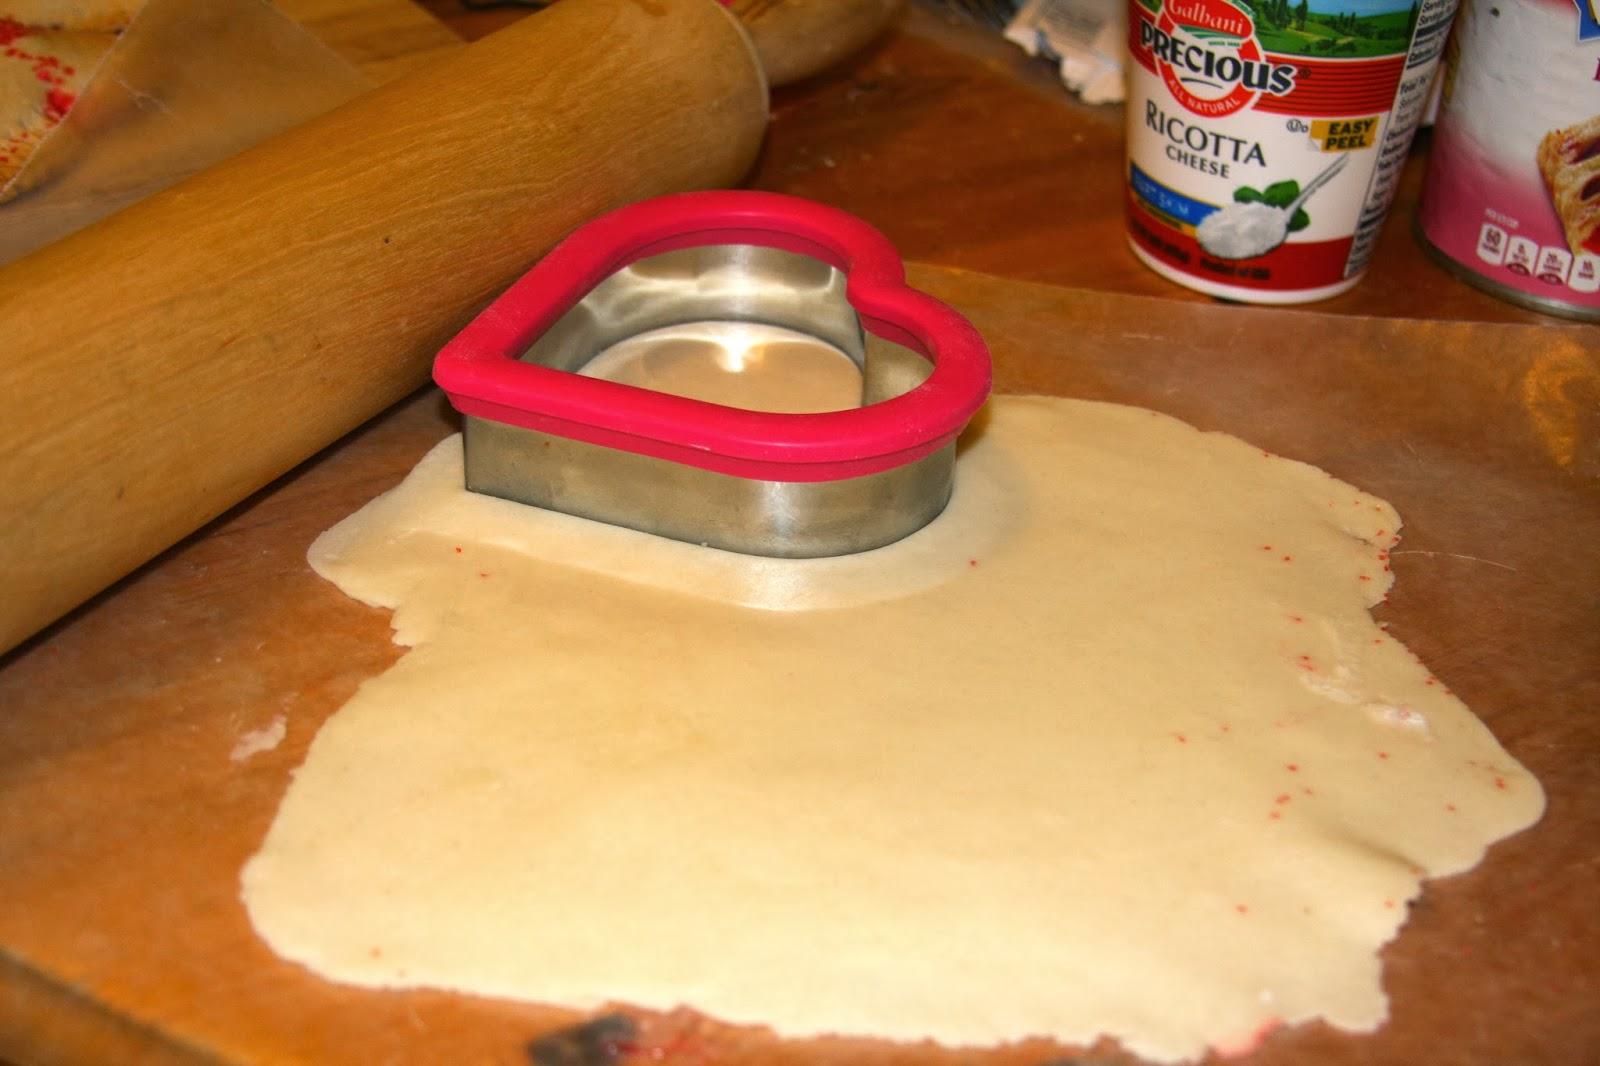 cutting the pie dough